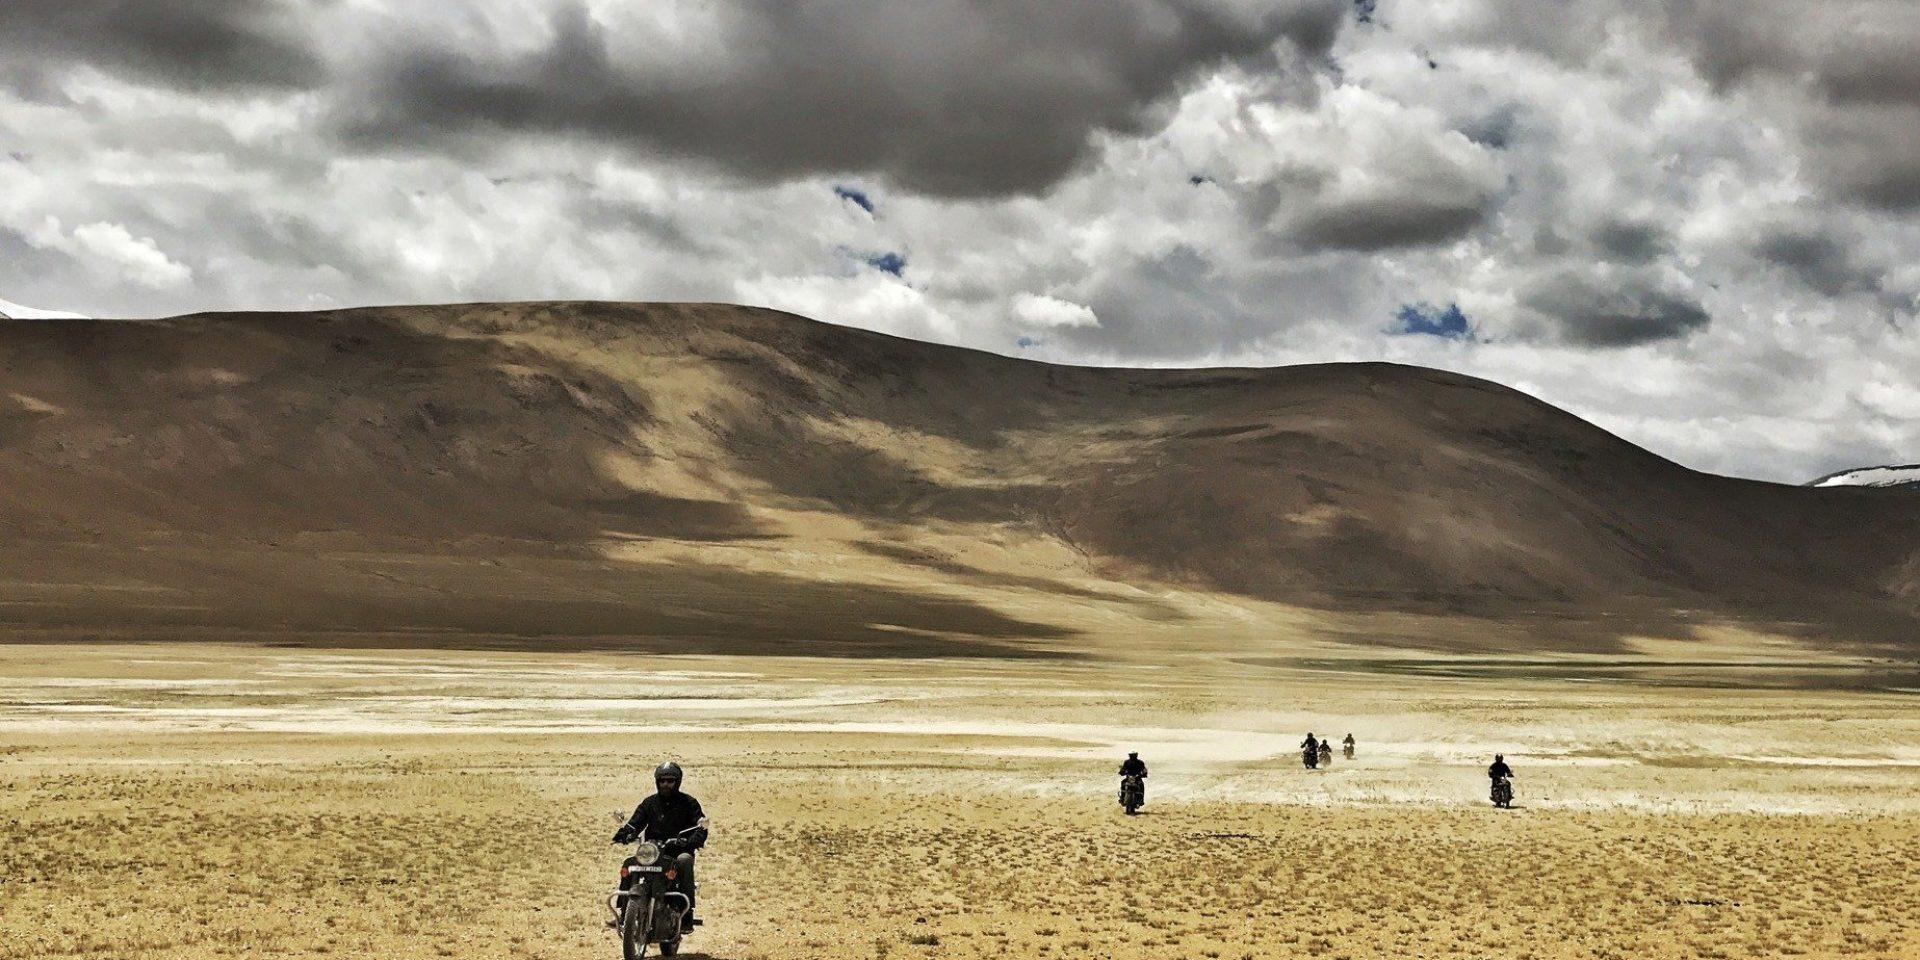 Motorrad-Roadtrip Himalaya - Die TRANSHIMALAYA